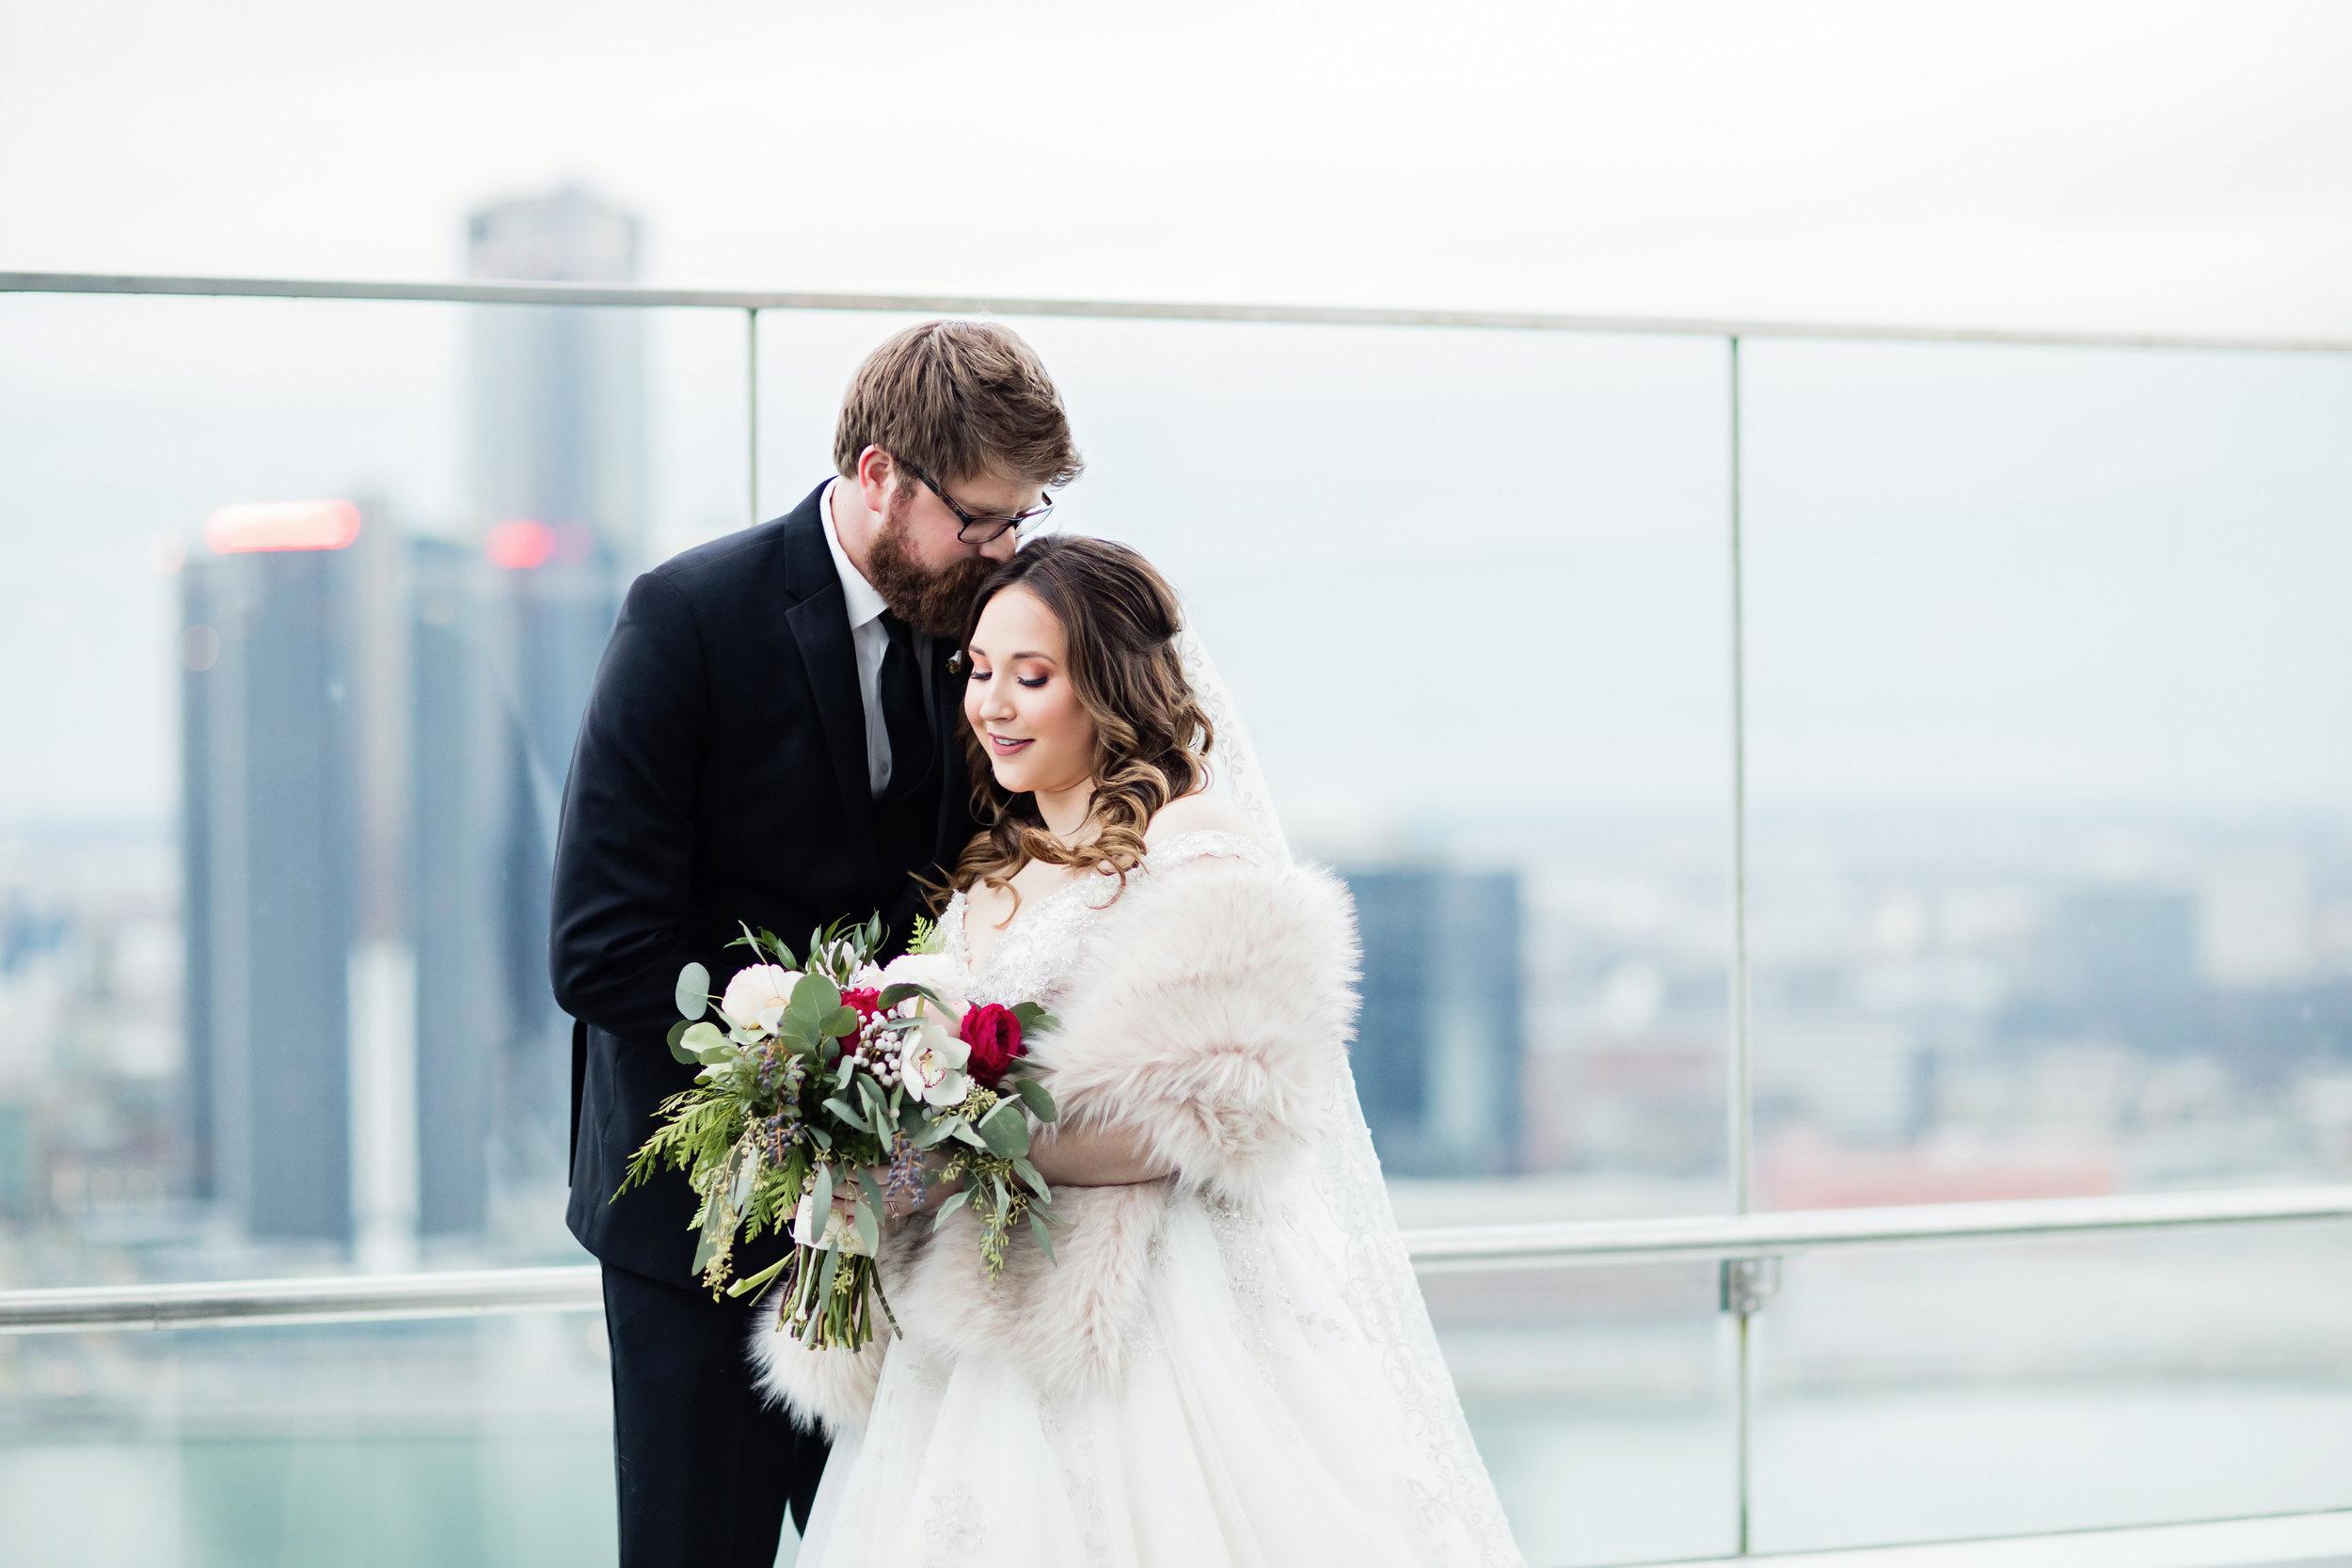 stylish-wedding-photography-windsor-toronto-ontario-wedding-photographer-winery-eryn-shea-photography-17.jpg